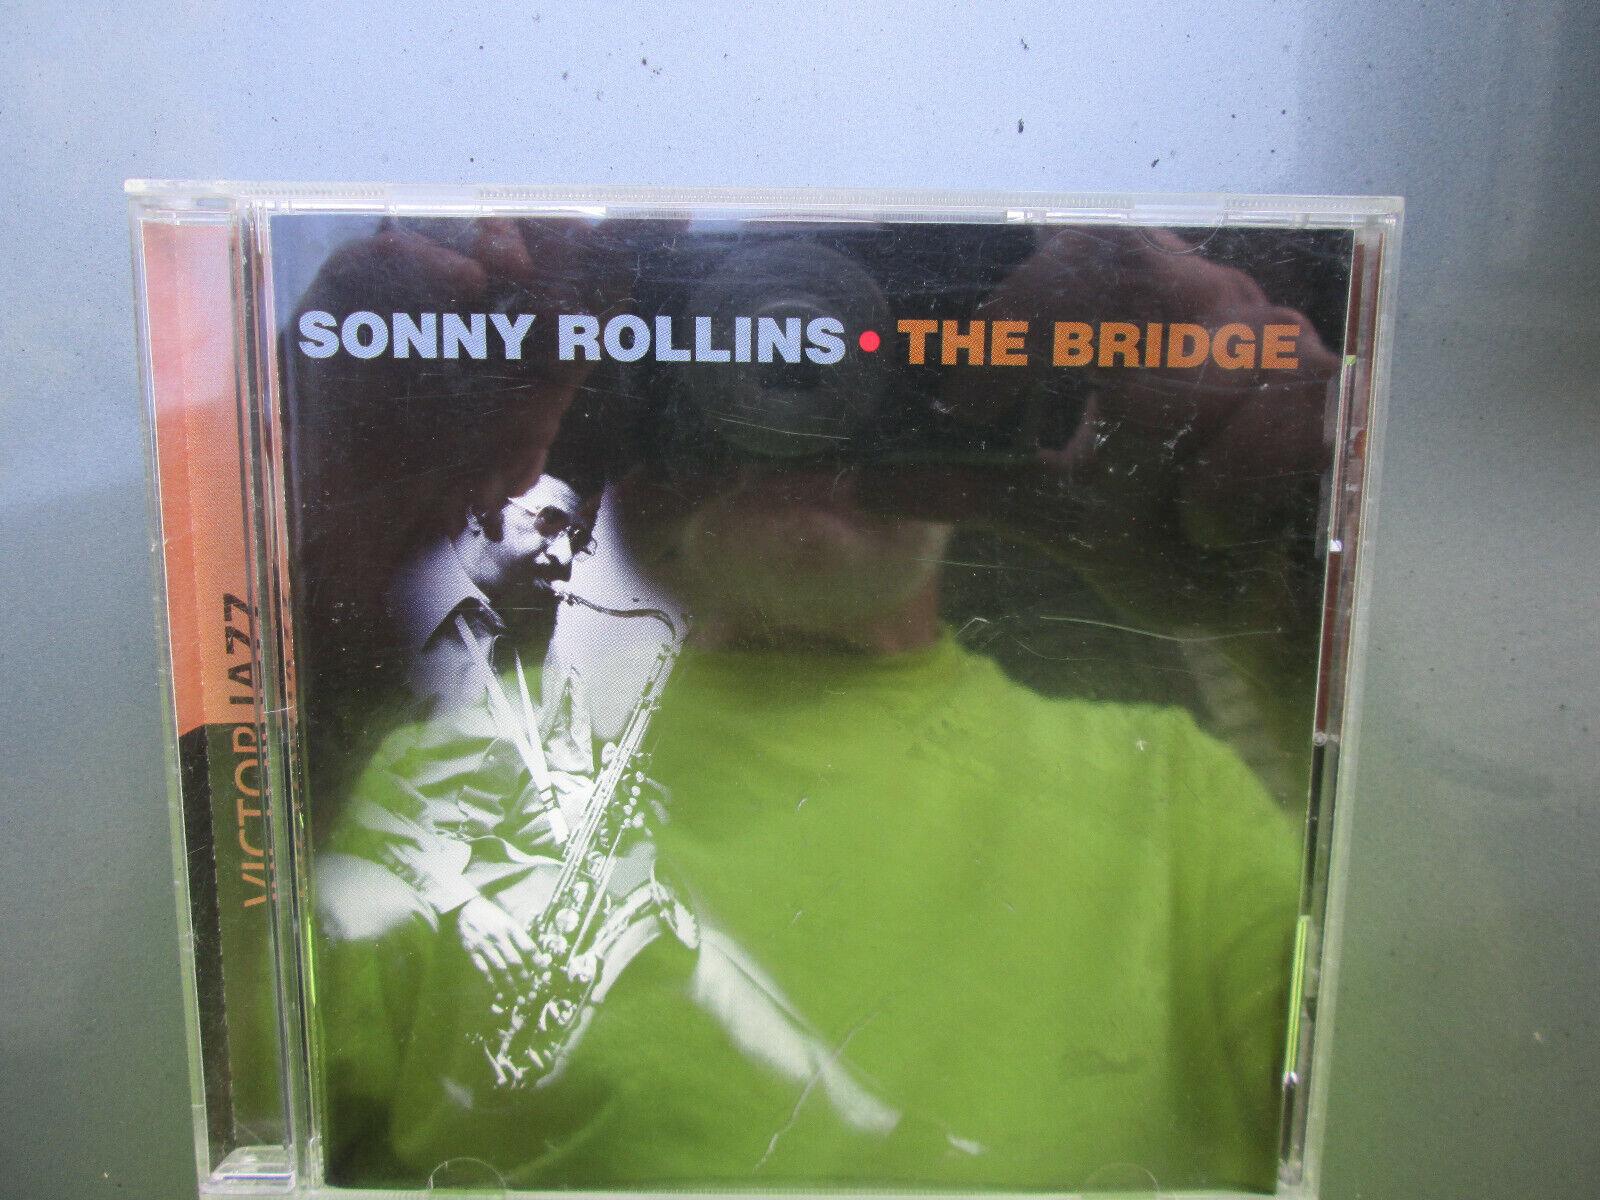 Sonny Rollins The Bridge Jazz Sax RARE CD Album Jazz NICE CLEAN COPY  - $11.99